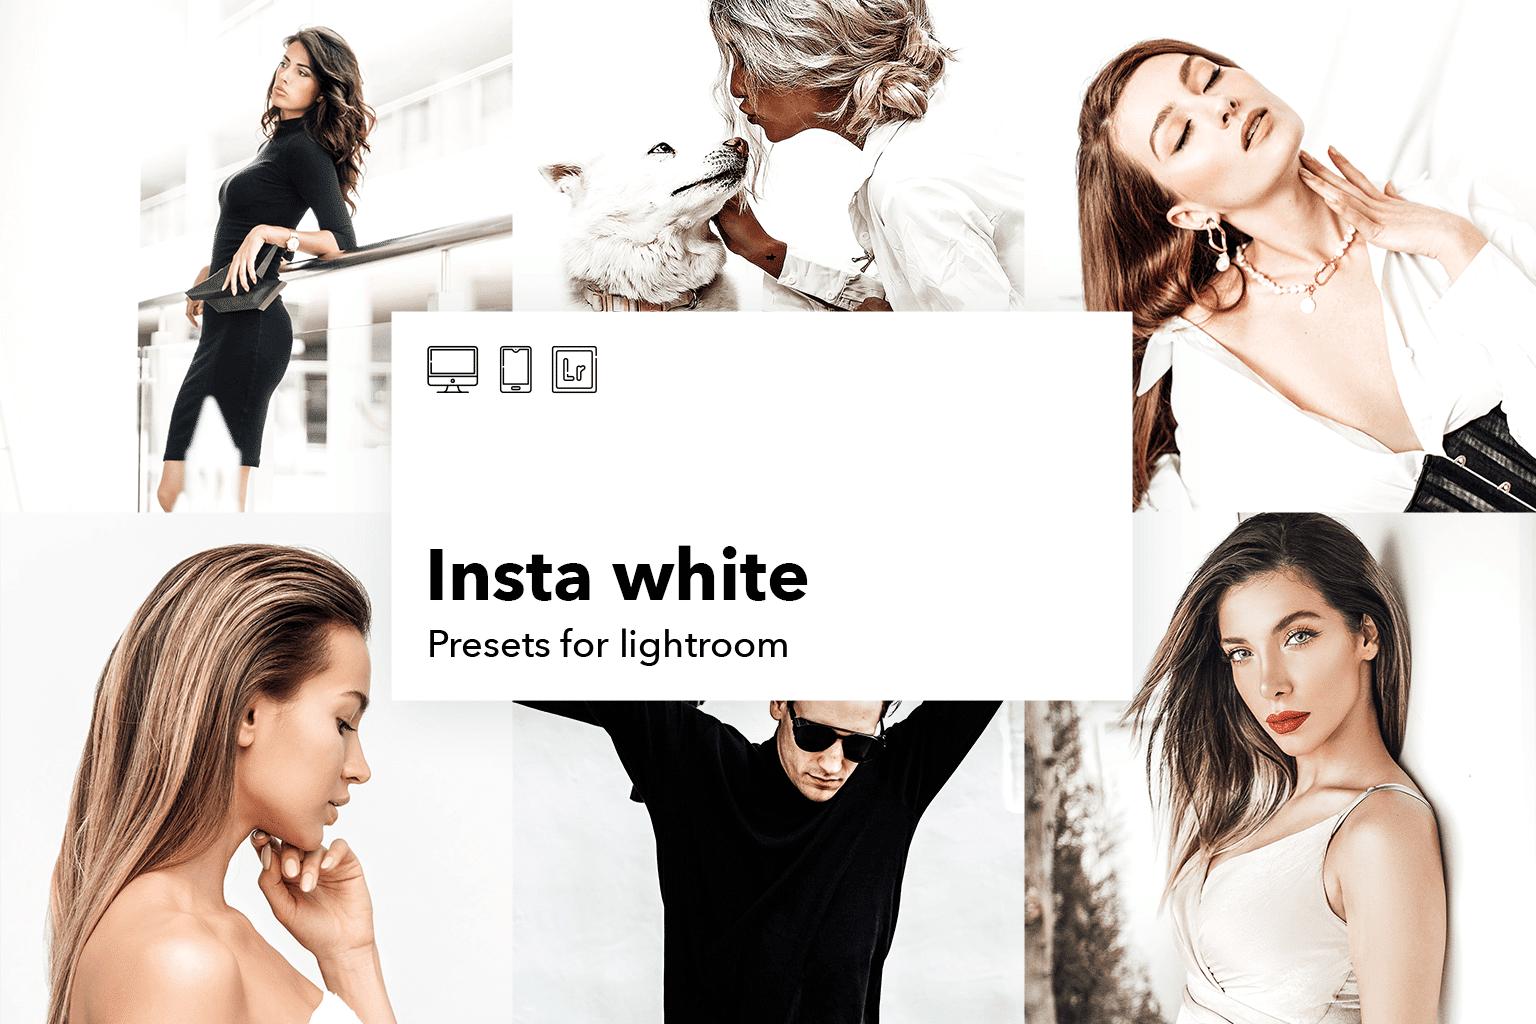 Insta-white